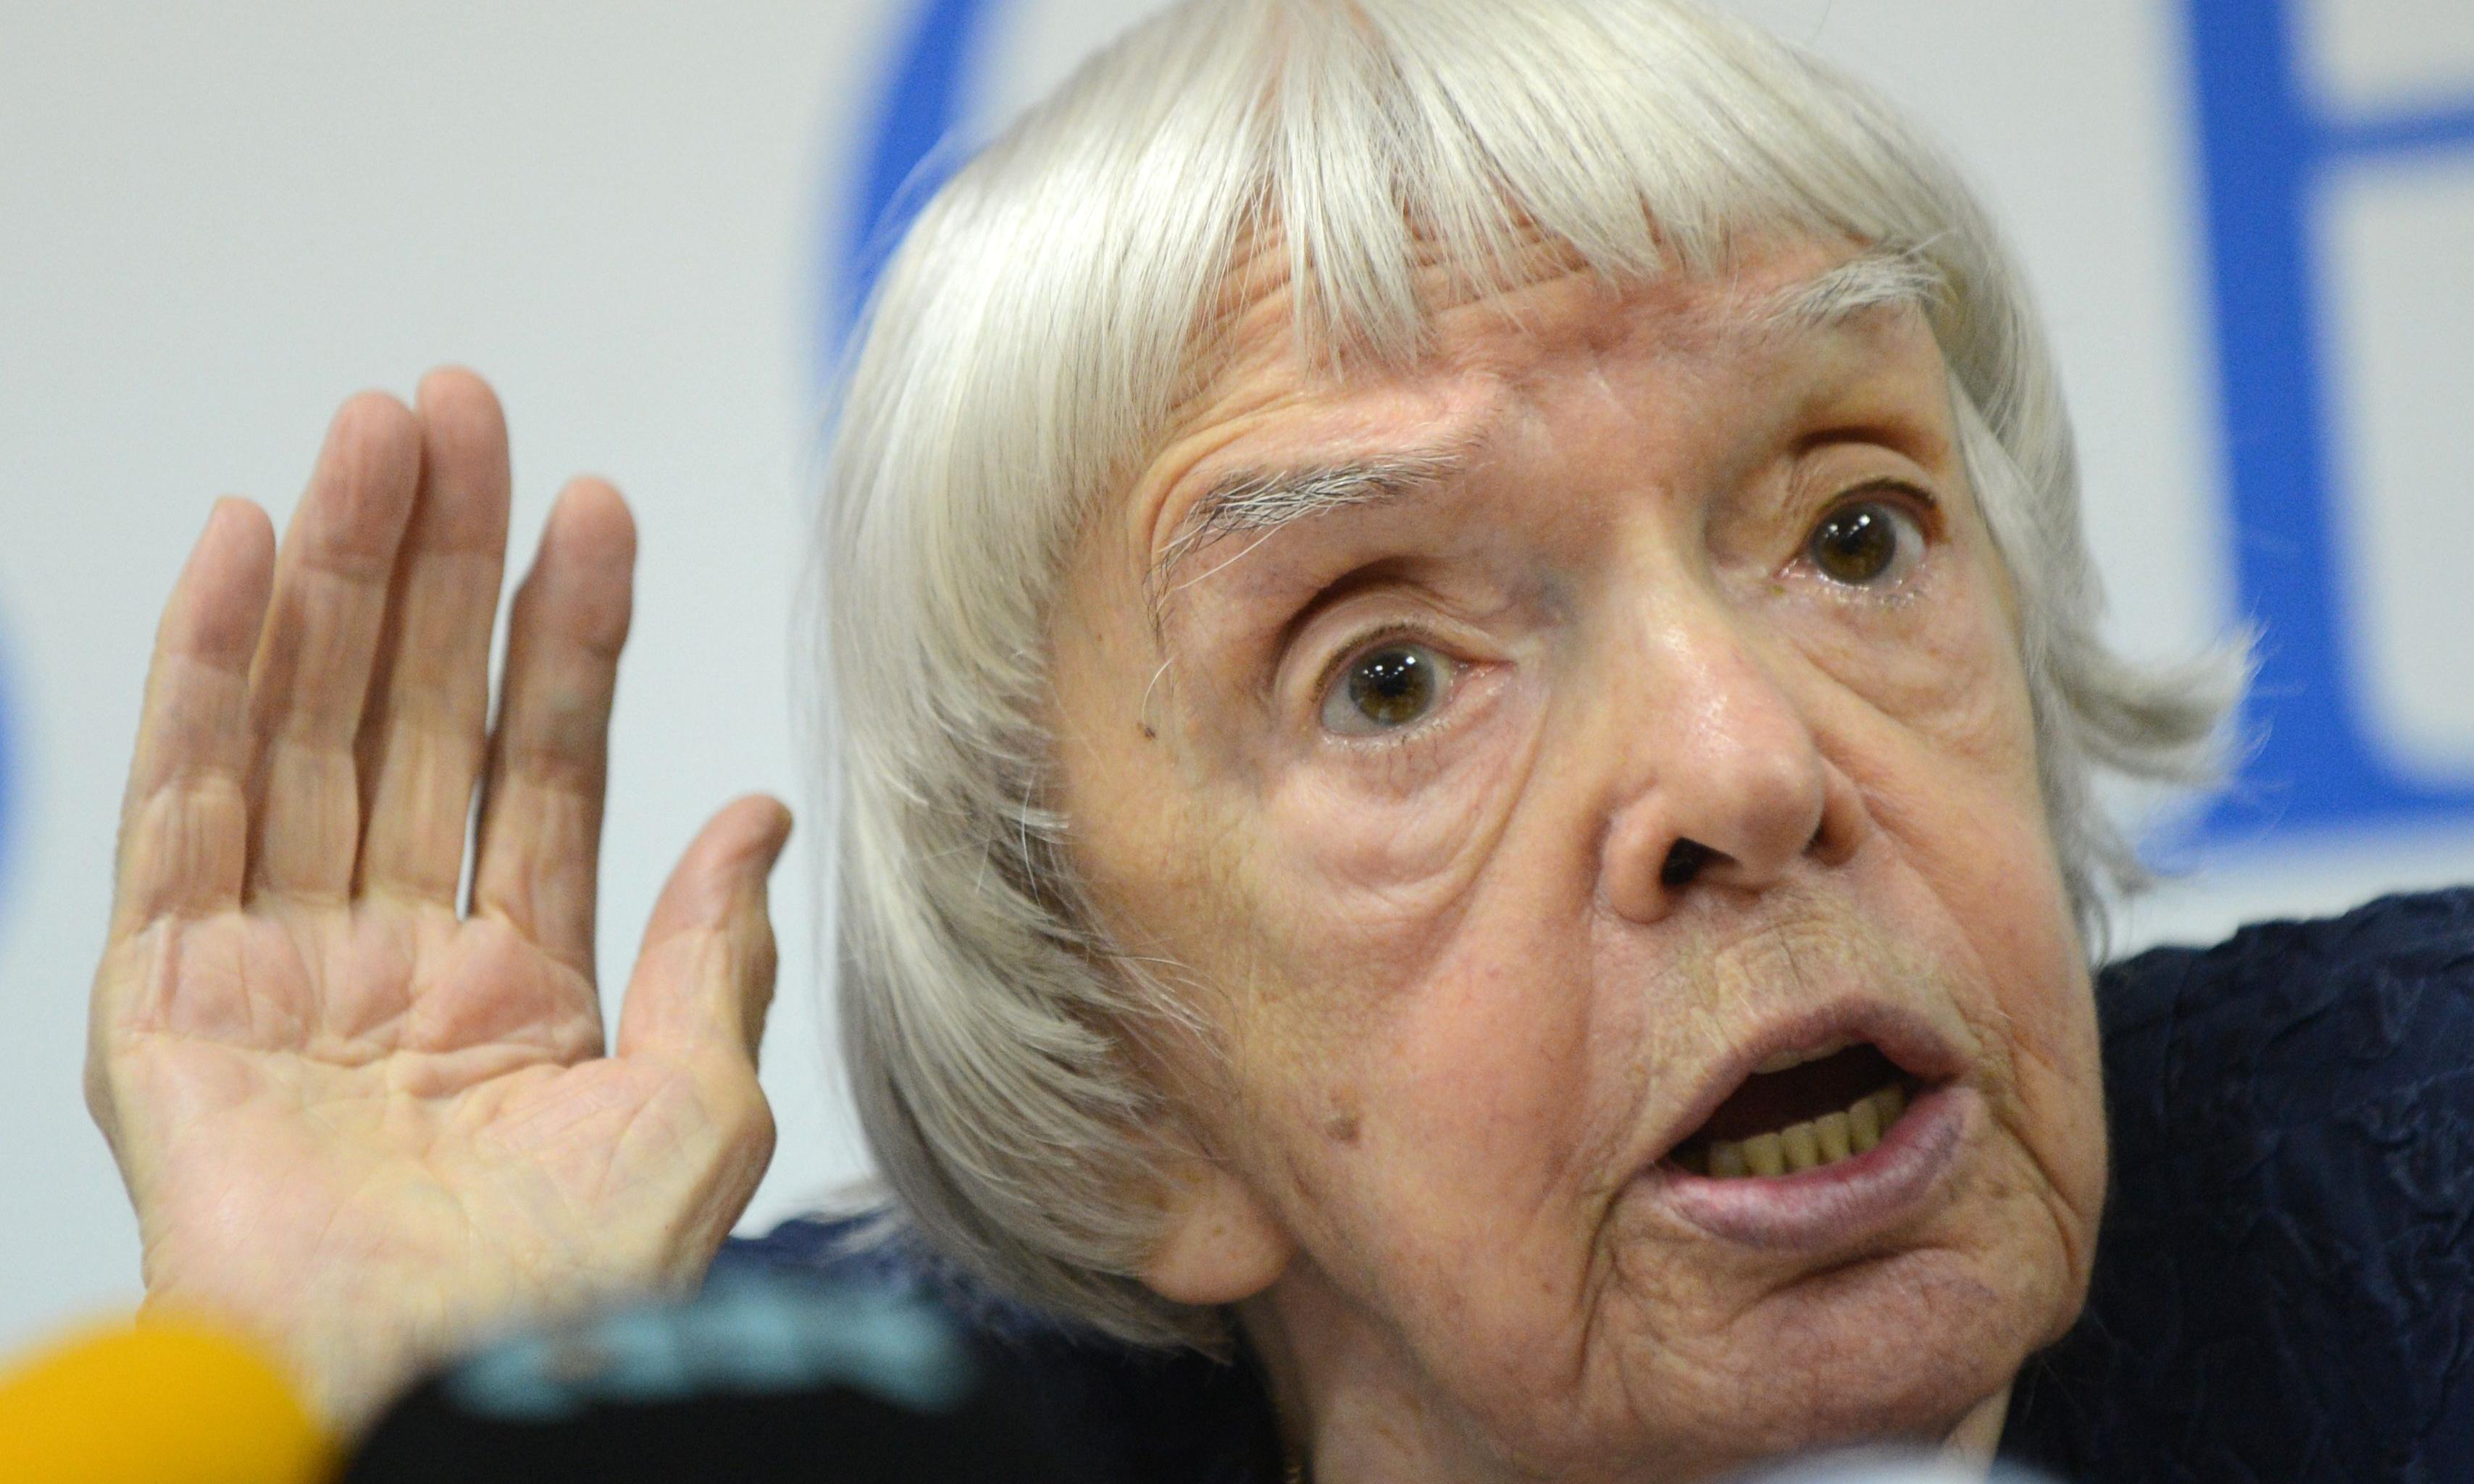 'Wise and humane': Soviet dissident Lyudmila Alexeyeva dies aged 91